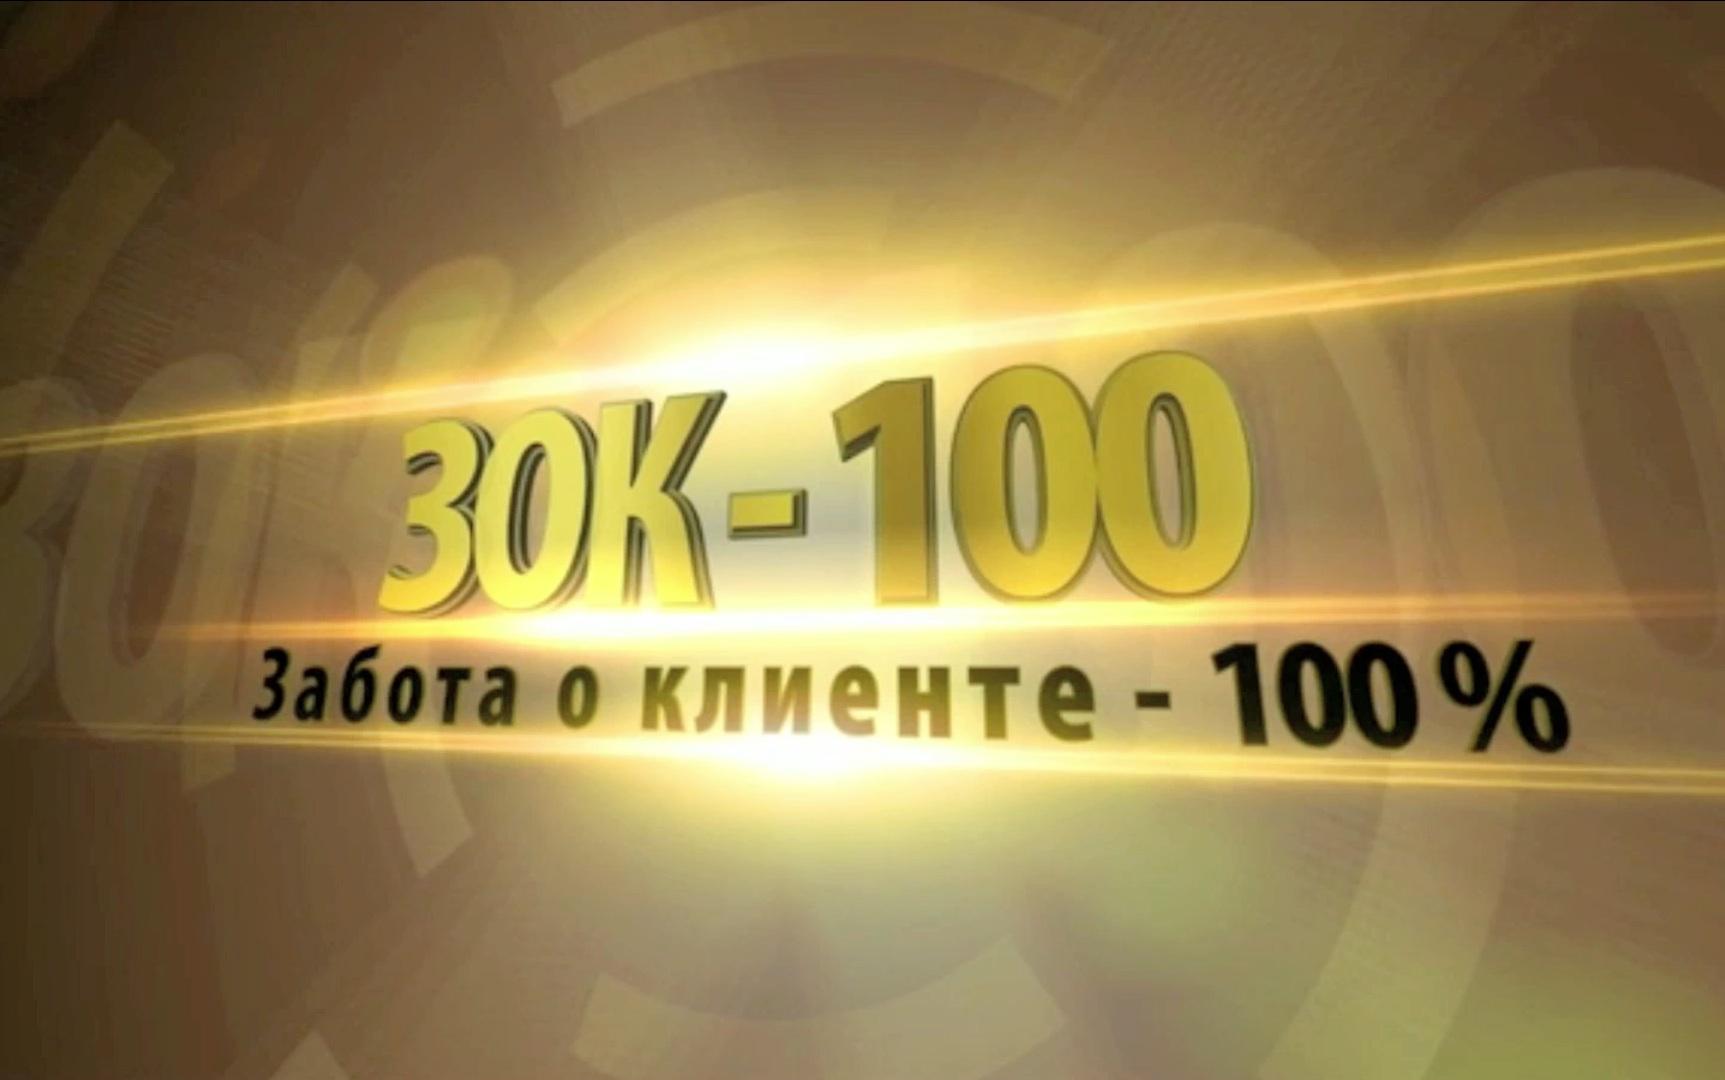 ЗОК100: Забота о клиенте – 100%